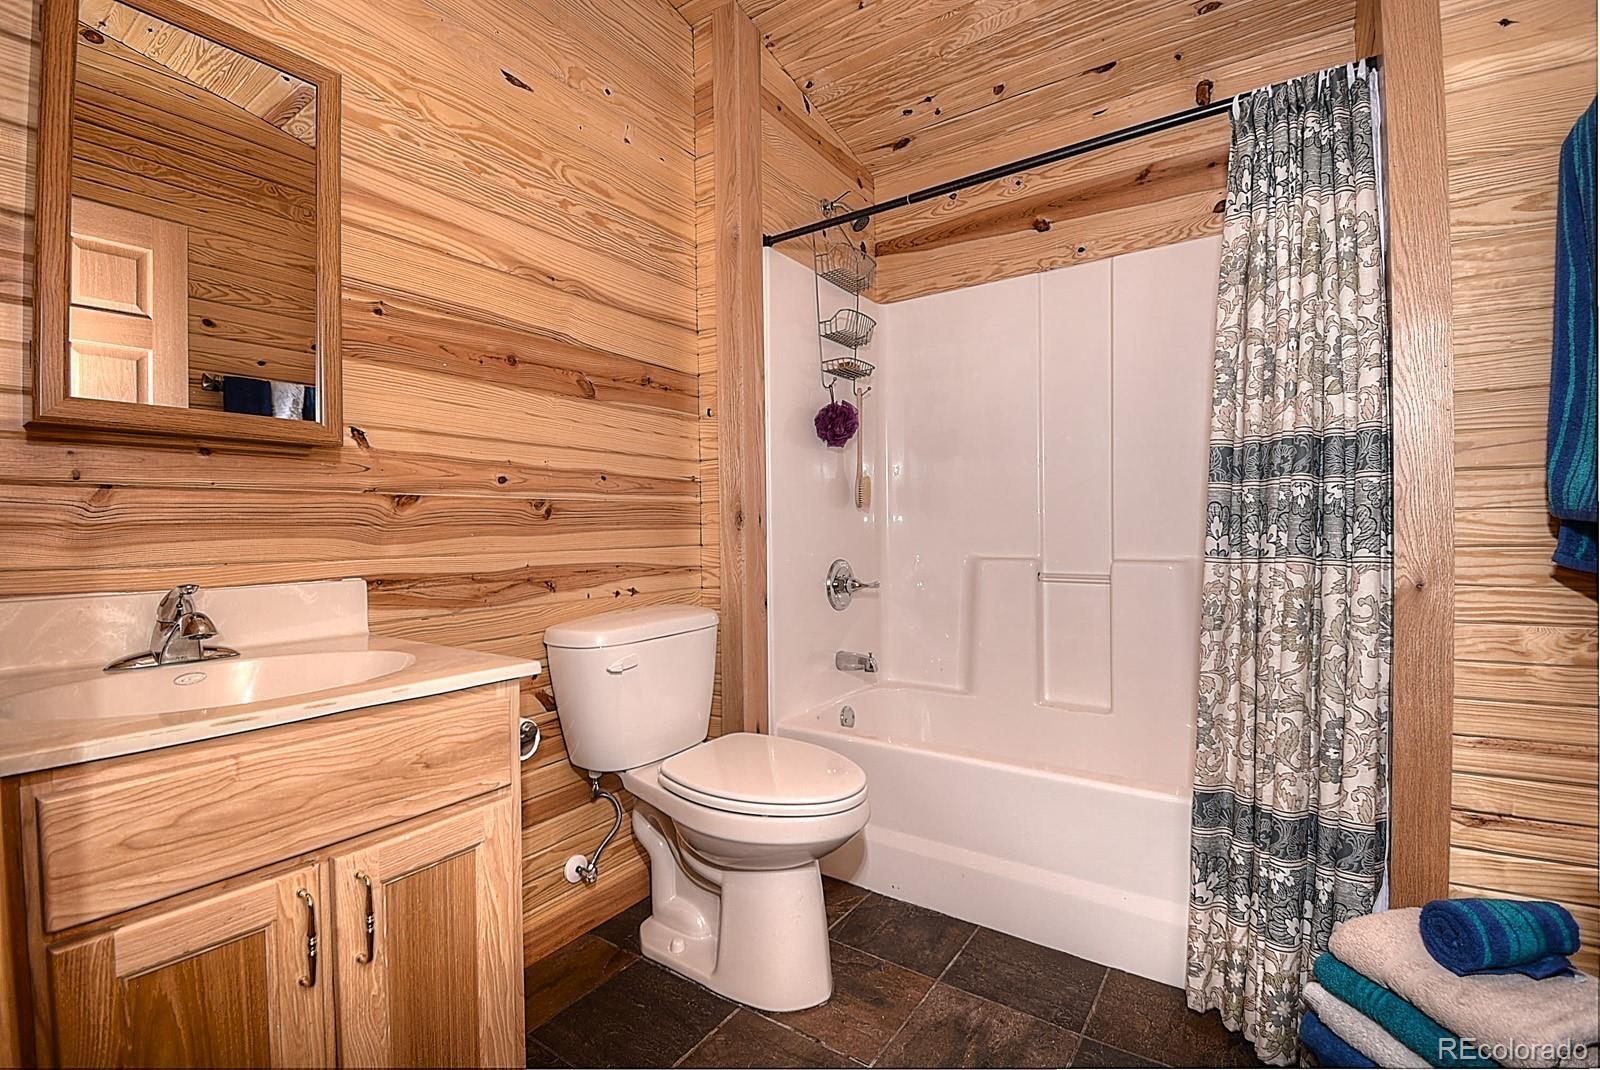 MLS# 8182693 - 24 - 396 Eagle Nest Trail, Guffey, CO 80820